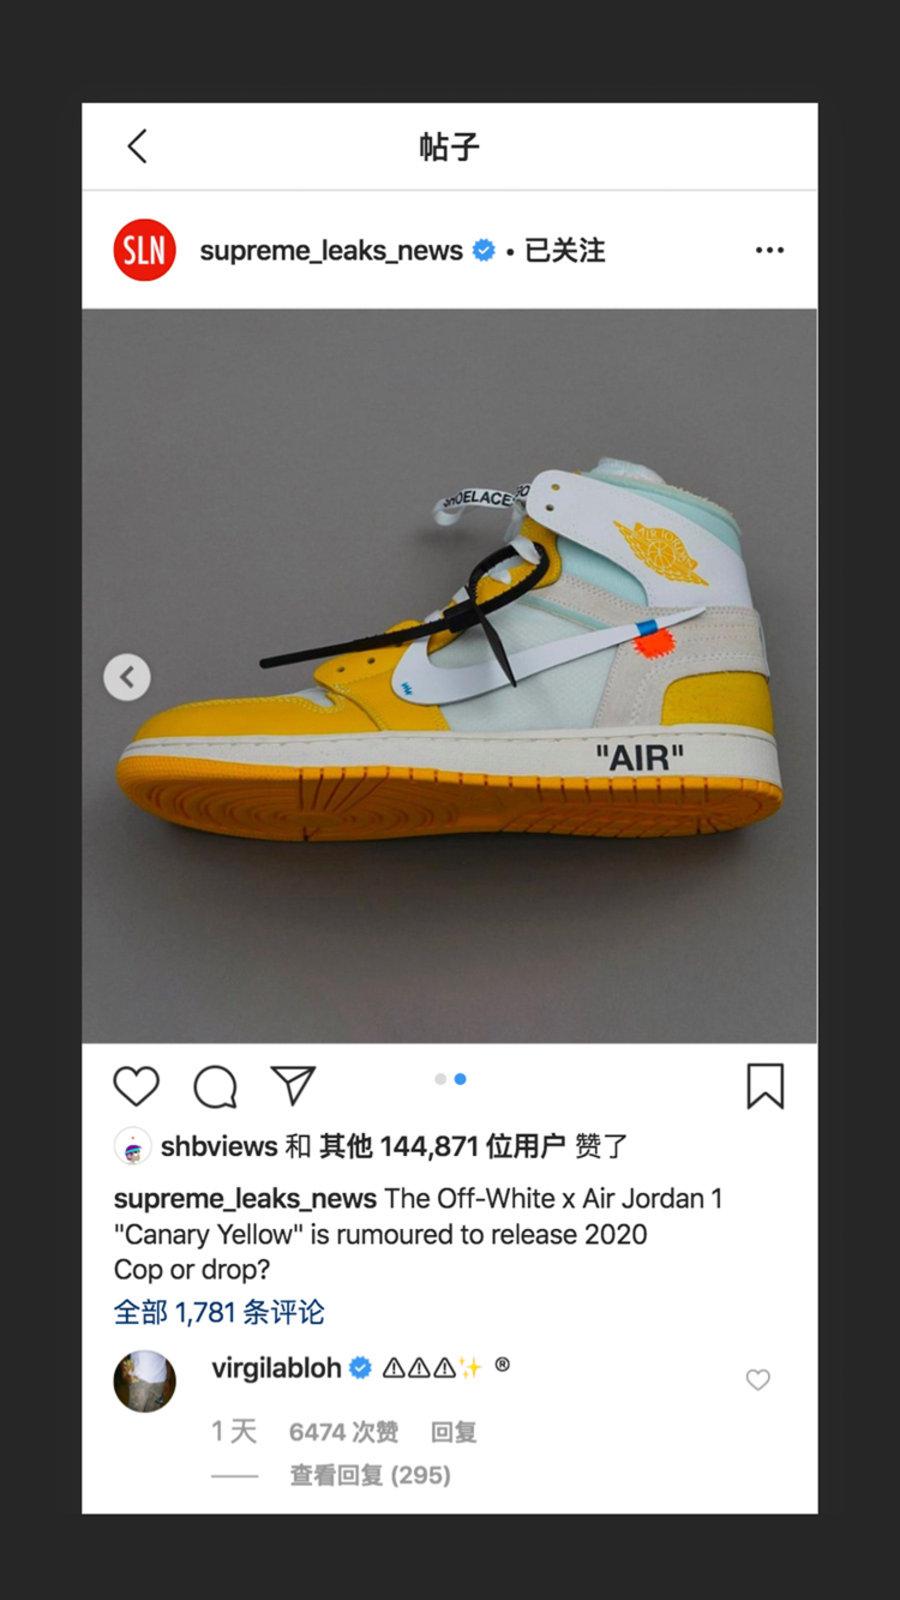 OFF-WHITE,AJ,AJ1,Canary Yellow 最新消息!白黄 OW x AJ1 将不会在 2020 年发售!因为...